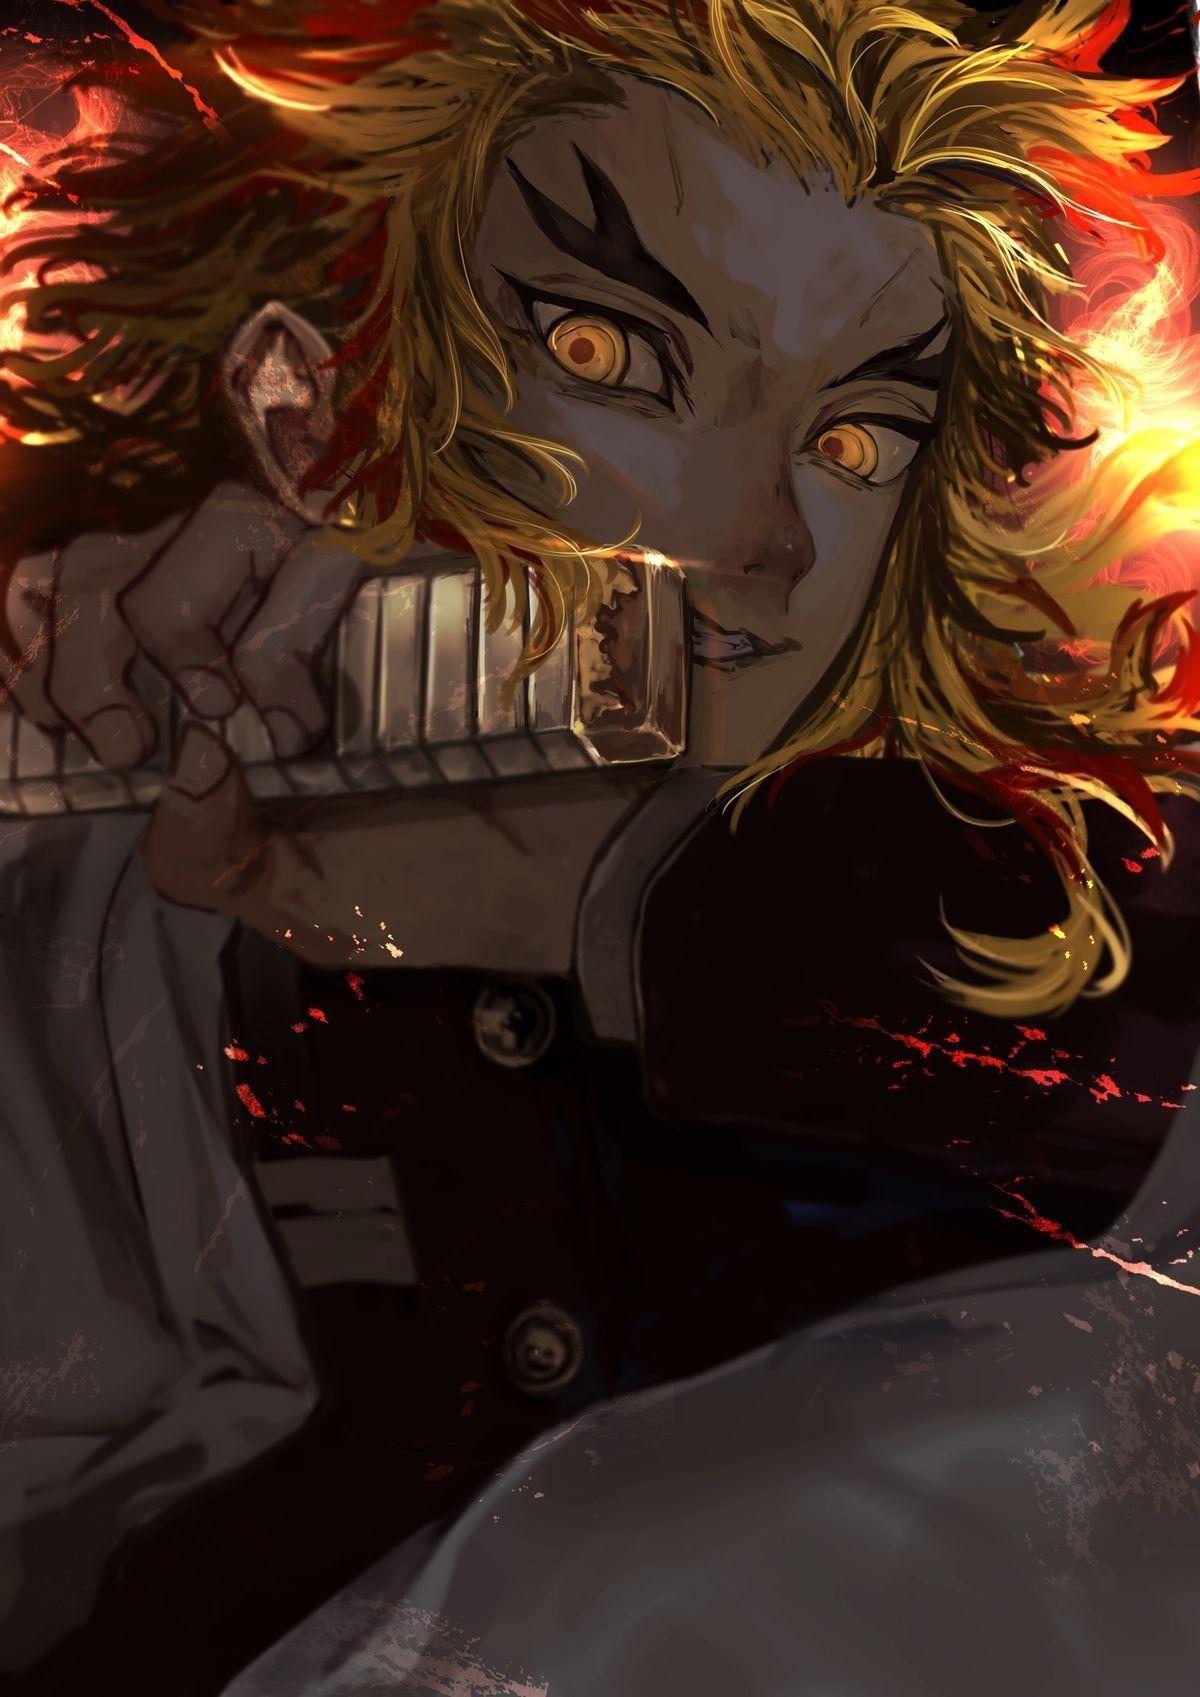 Pin by Dragon Master on Demon Slayer Kimetsu no Yaiba in